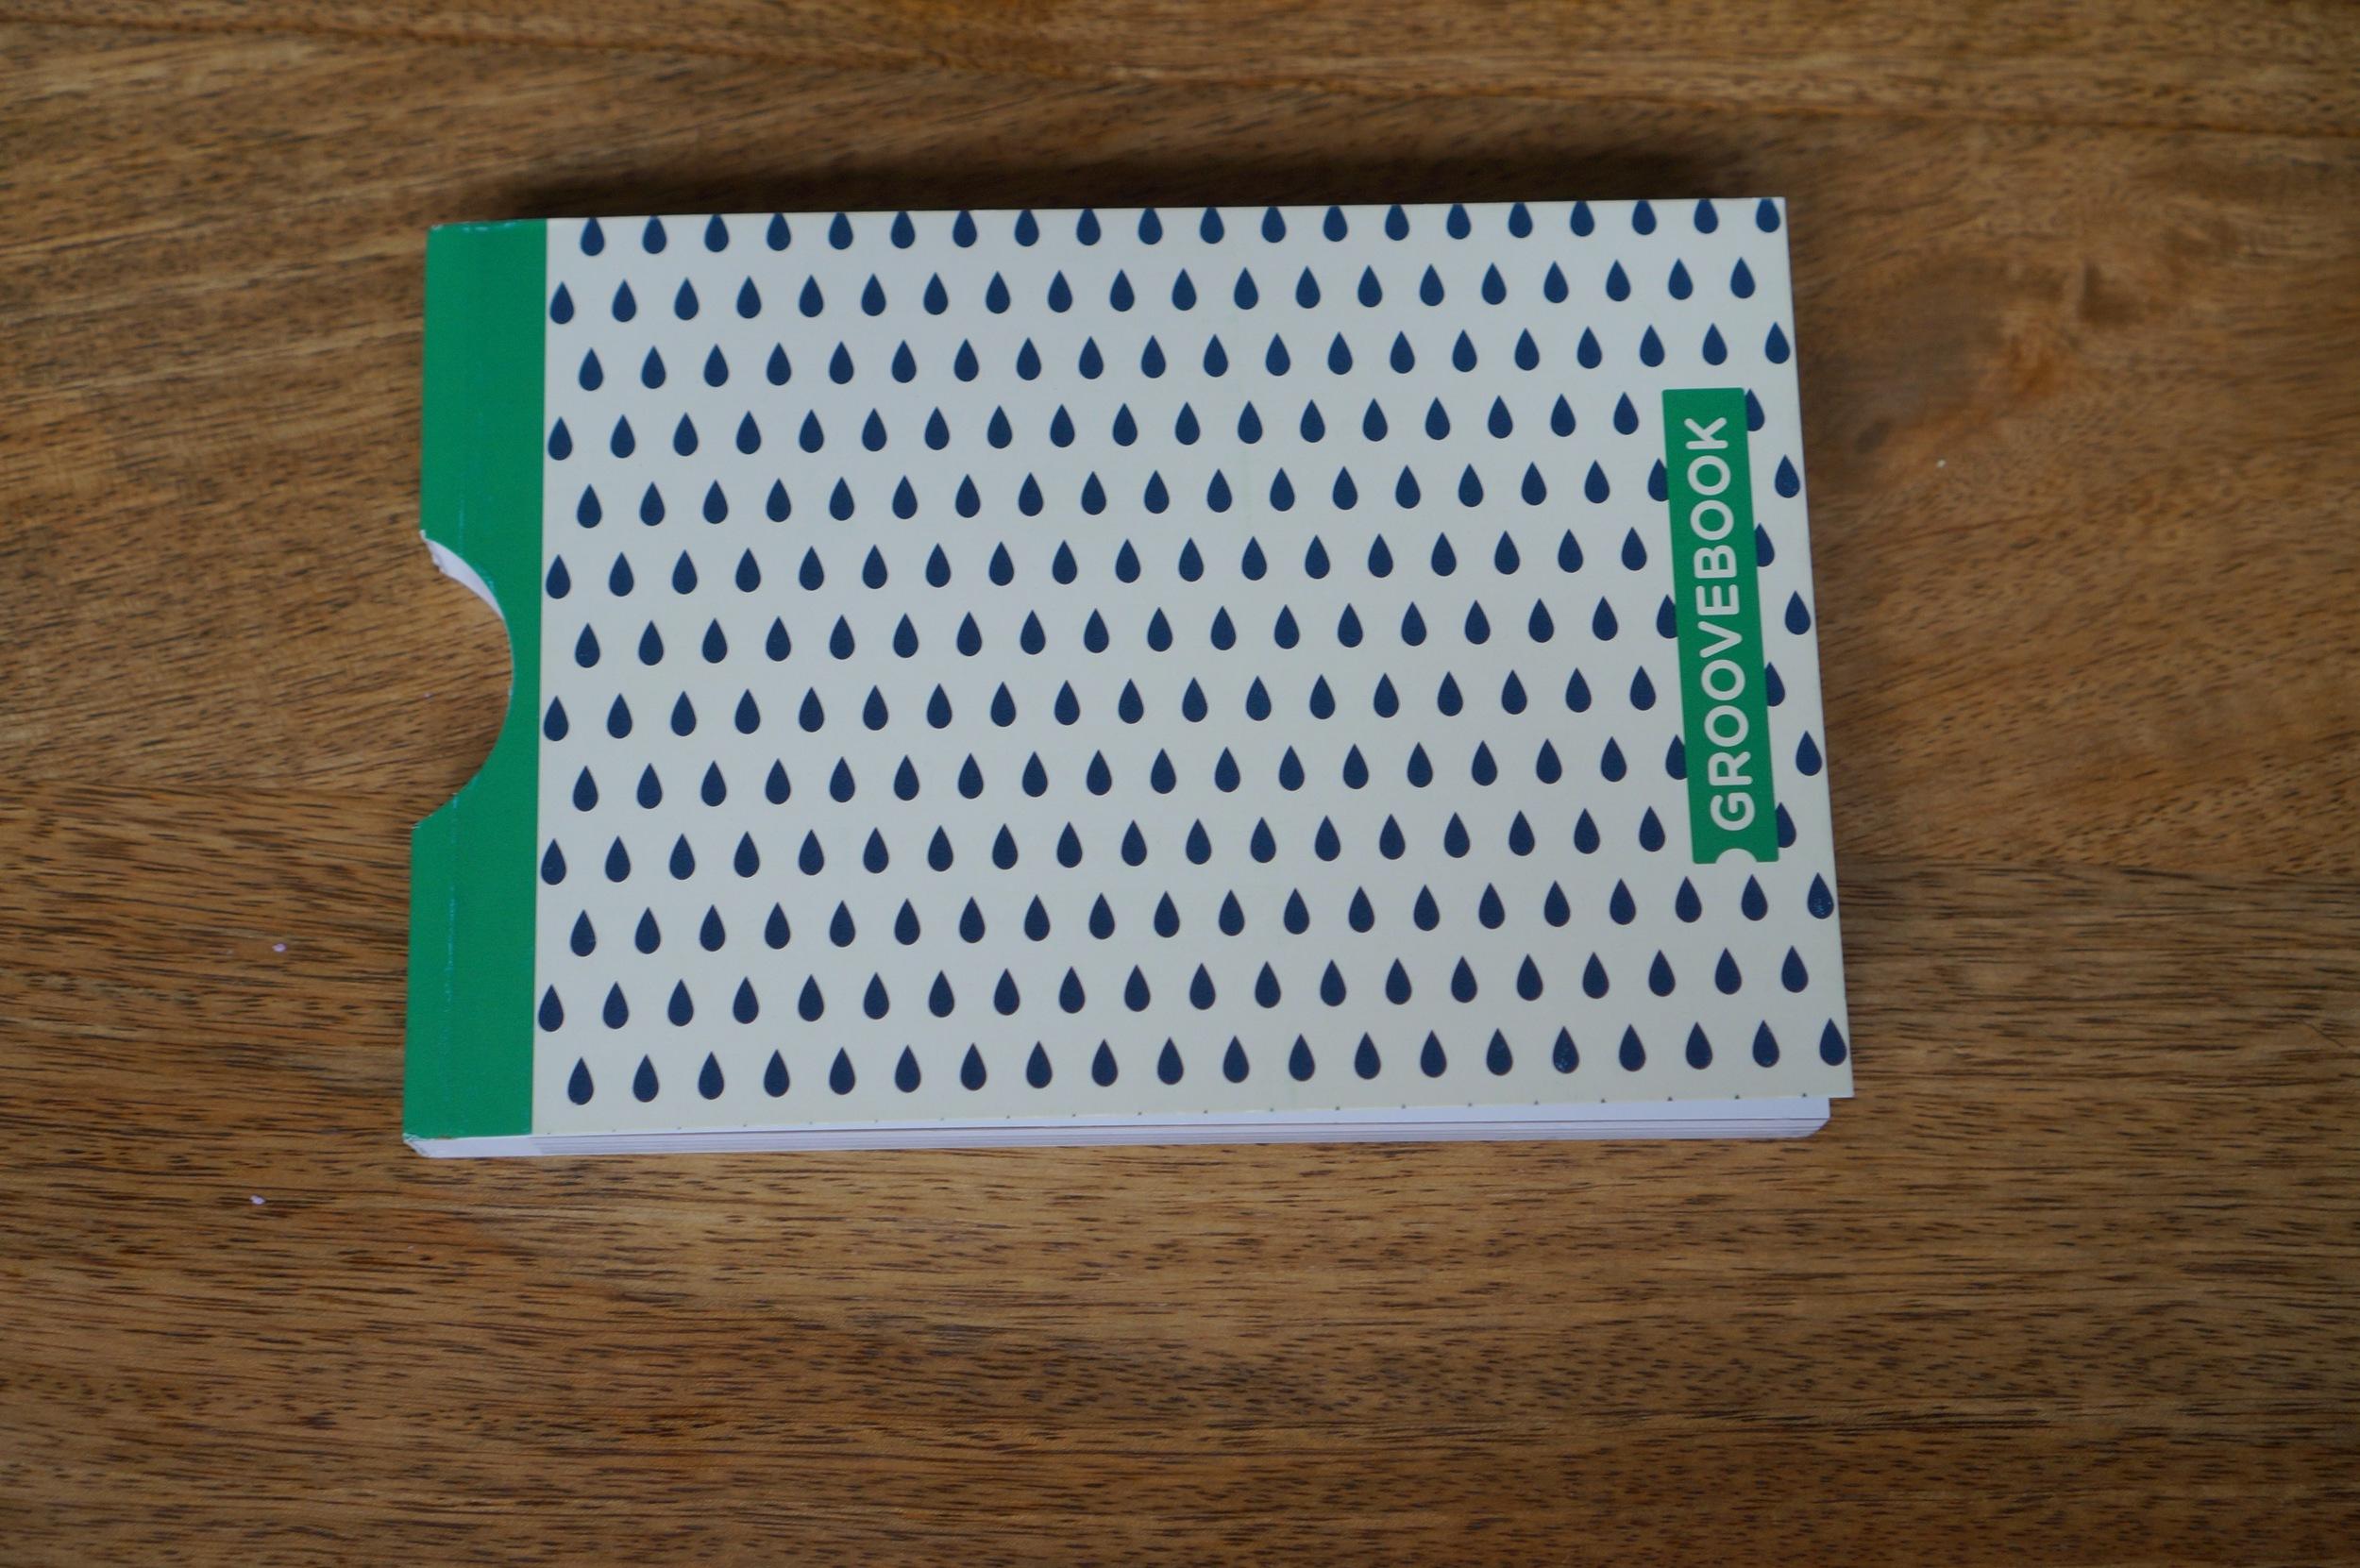 Groovebook: 4x6 album subscription, $2.99/month.